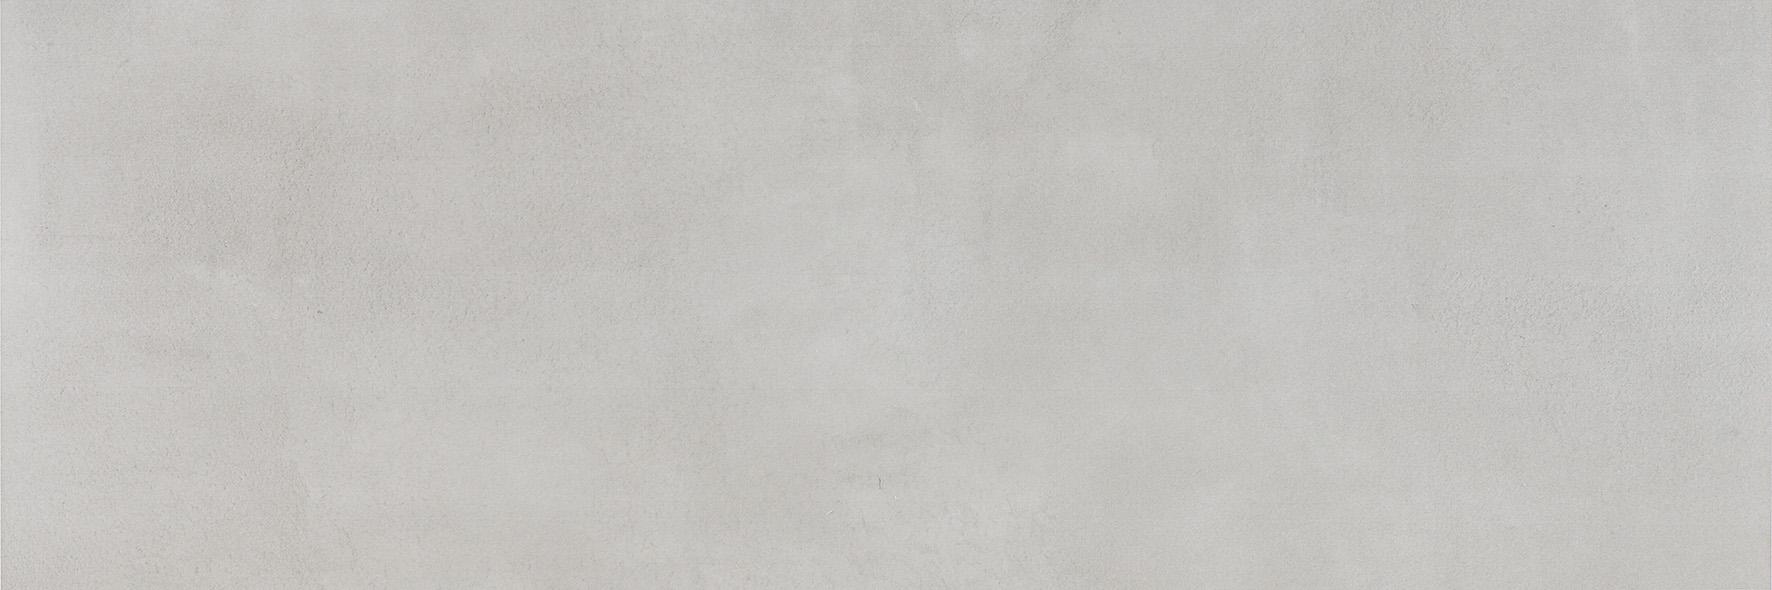 AGERI CENIZA 33,3x100